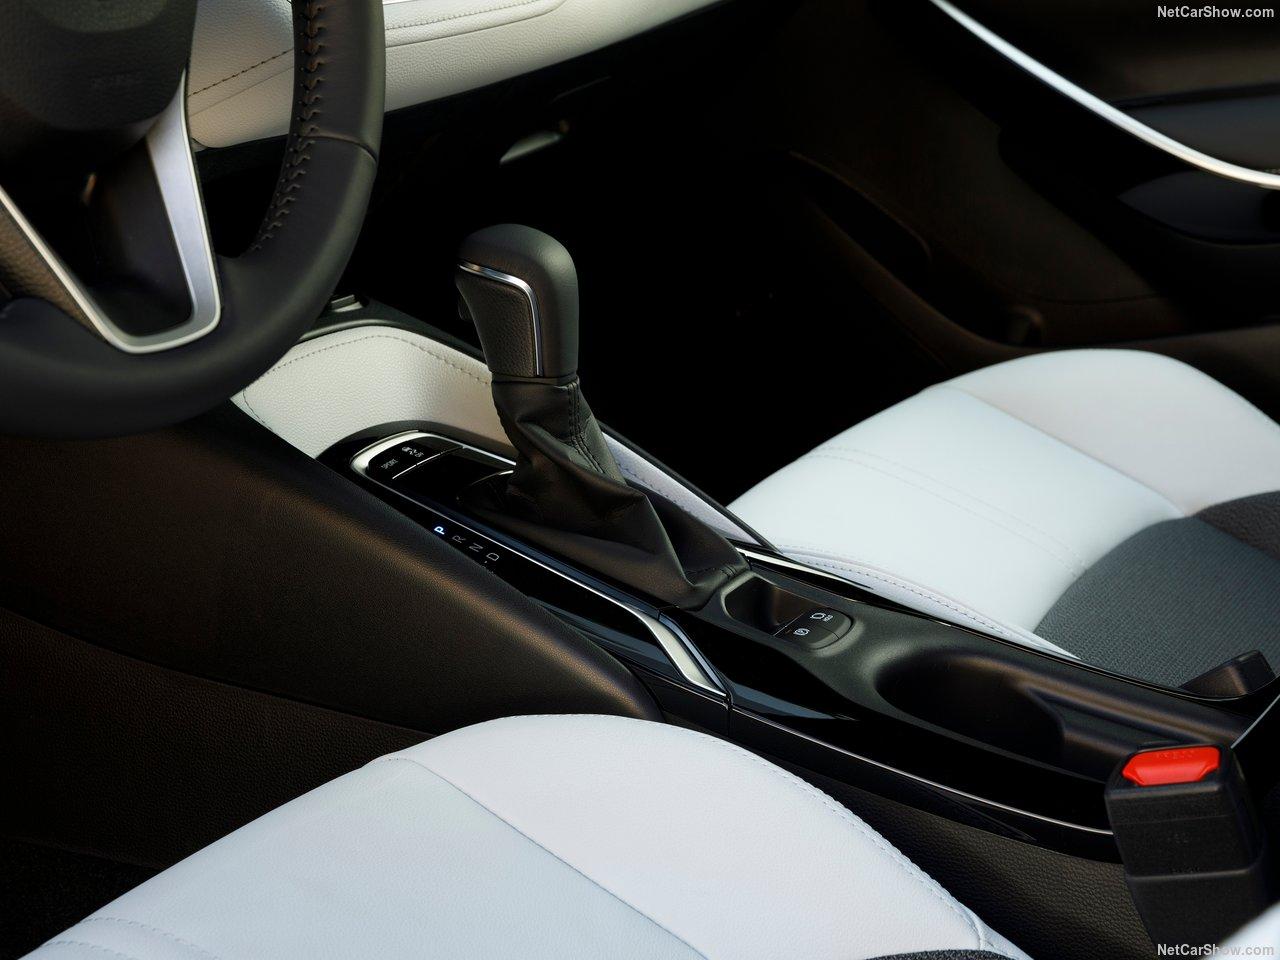 Toyota-Corolla_Hatchback-2019-1280-3e.jpg